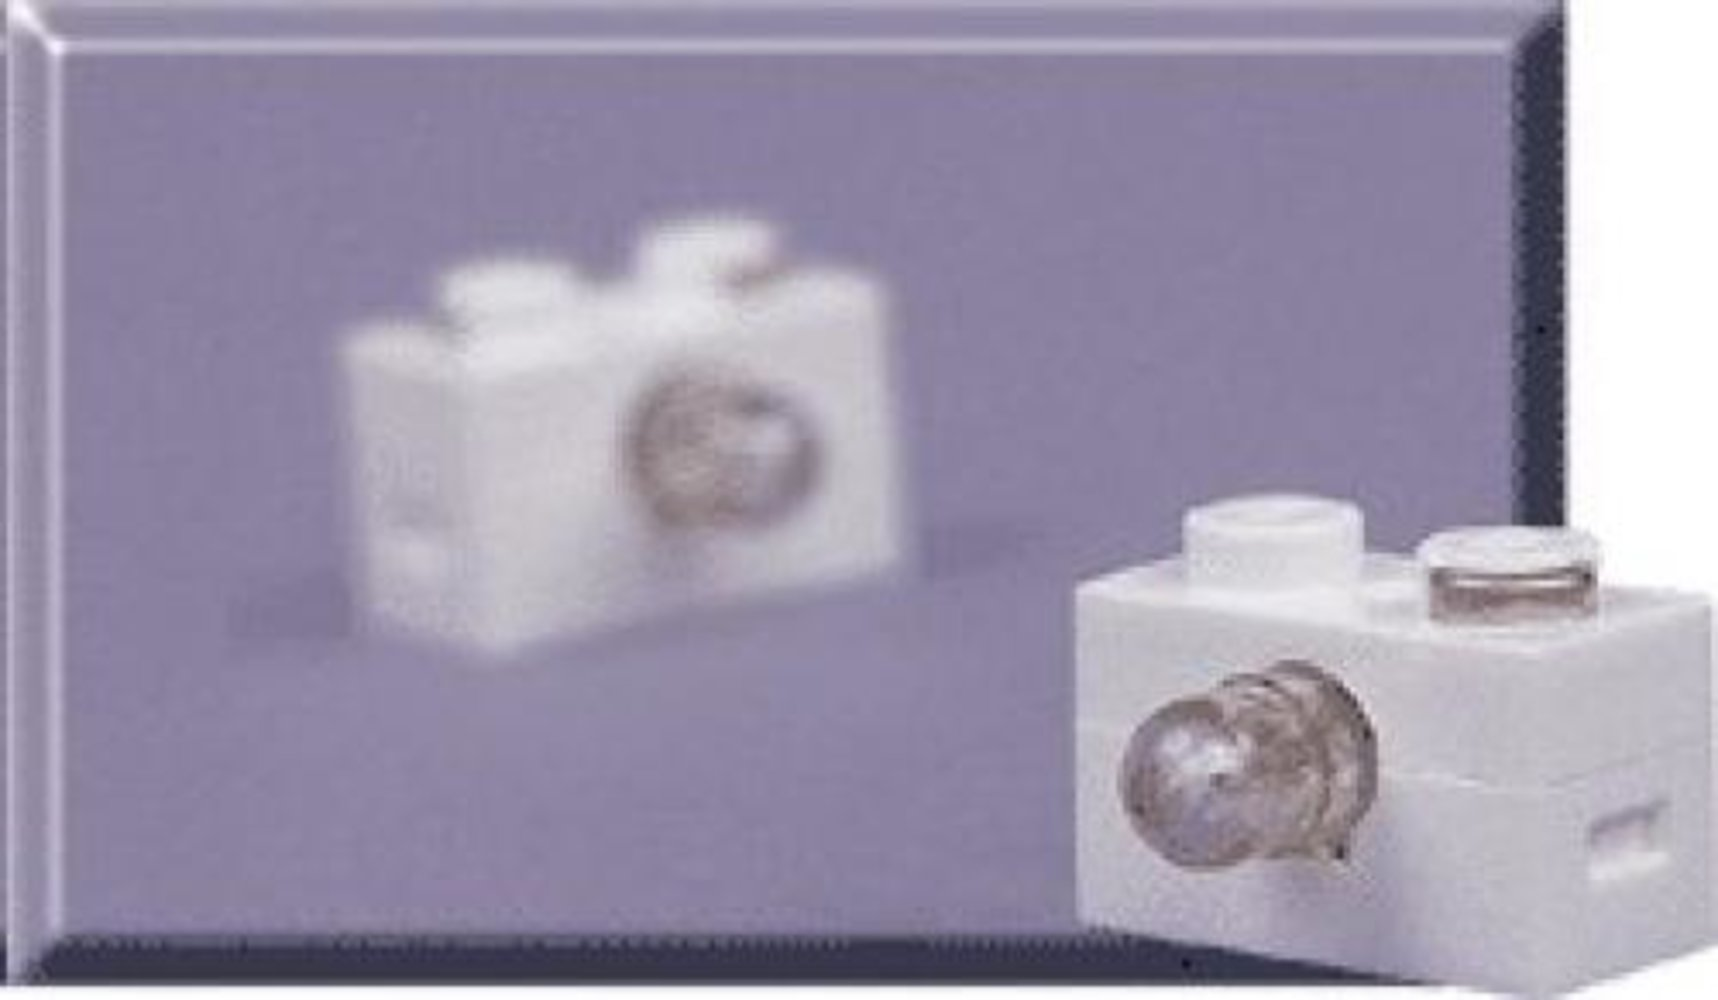 9-Volt 1 x 2 Lamp Brick (Pack of 2)